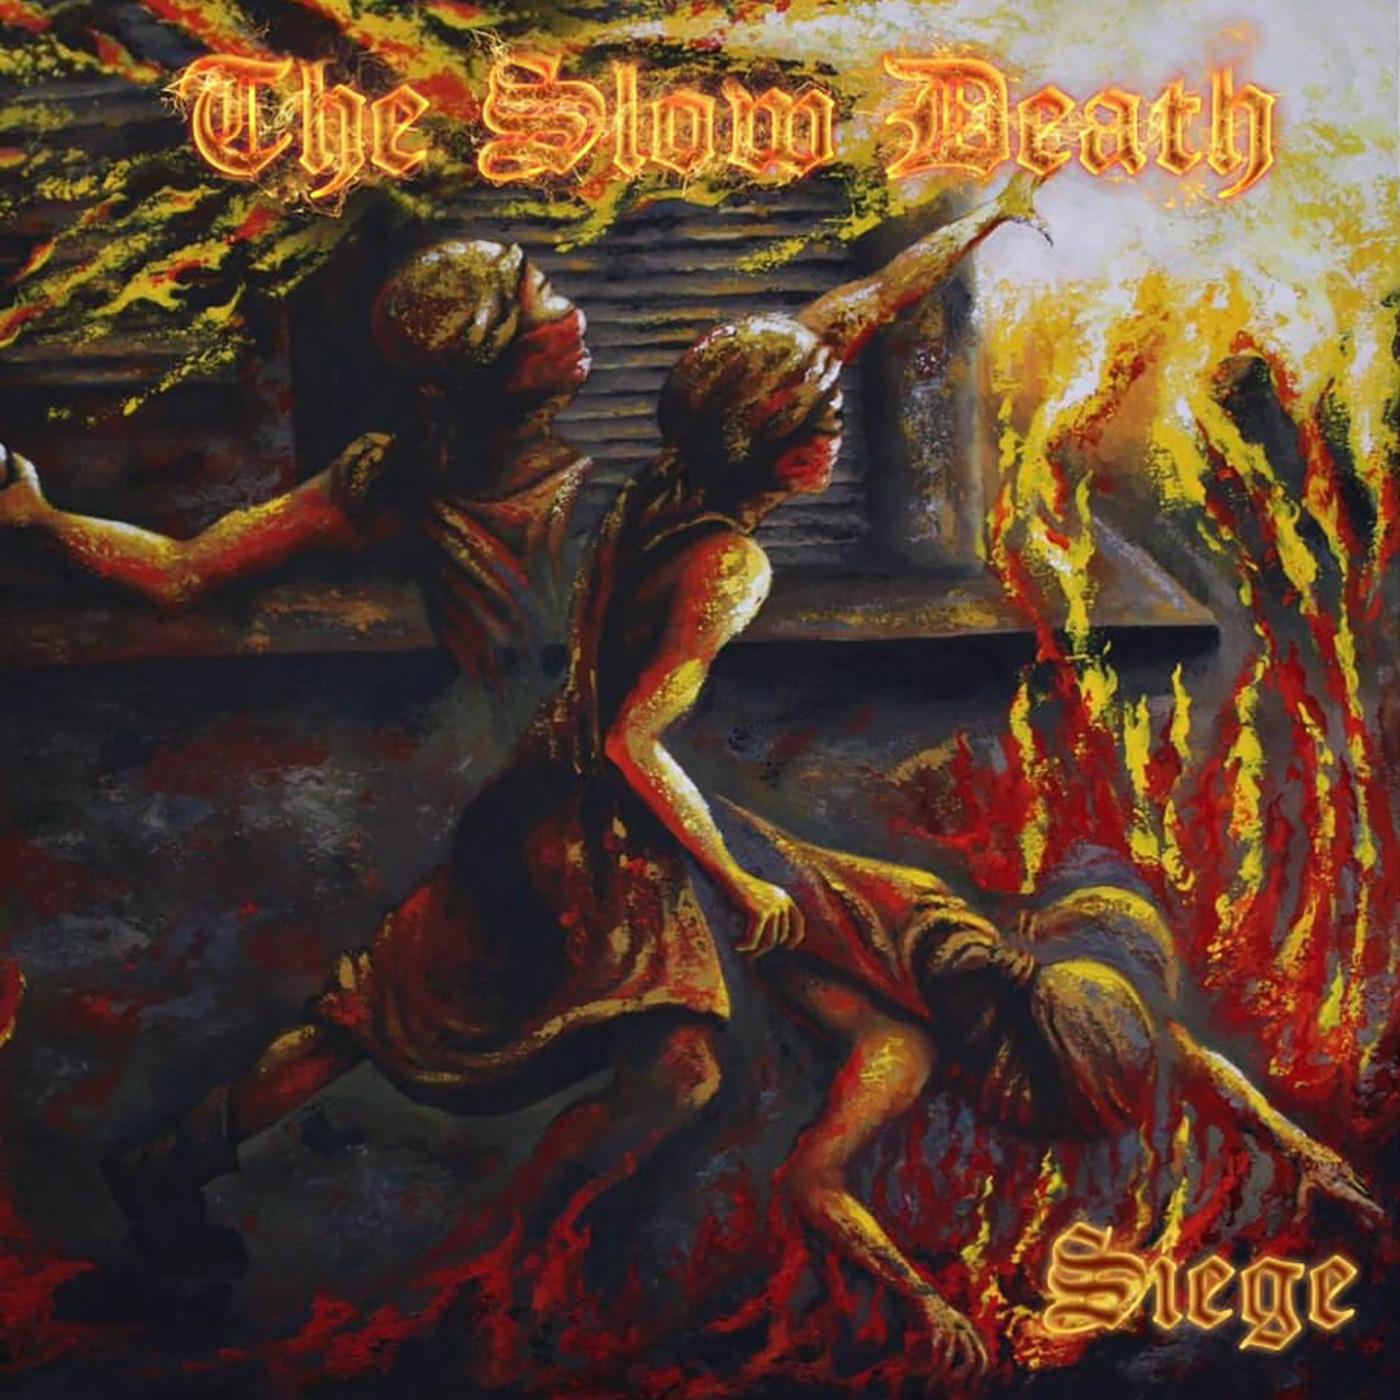 the slow death siege